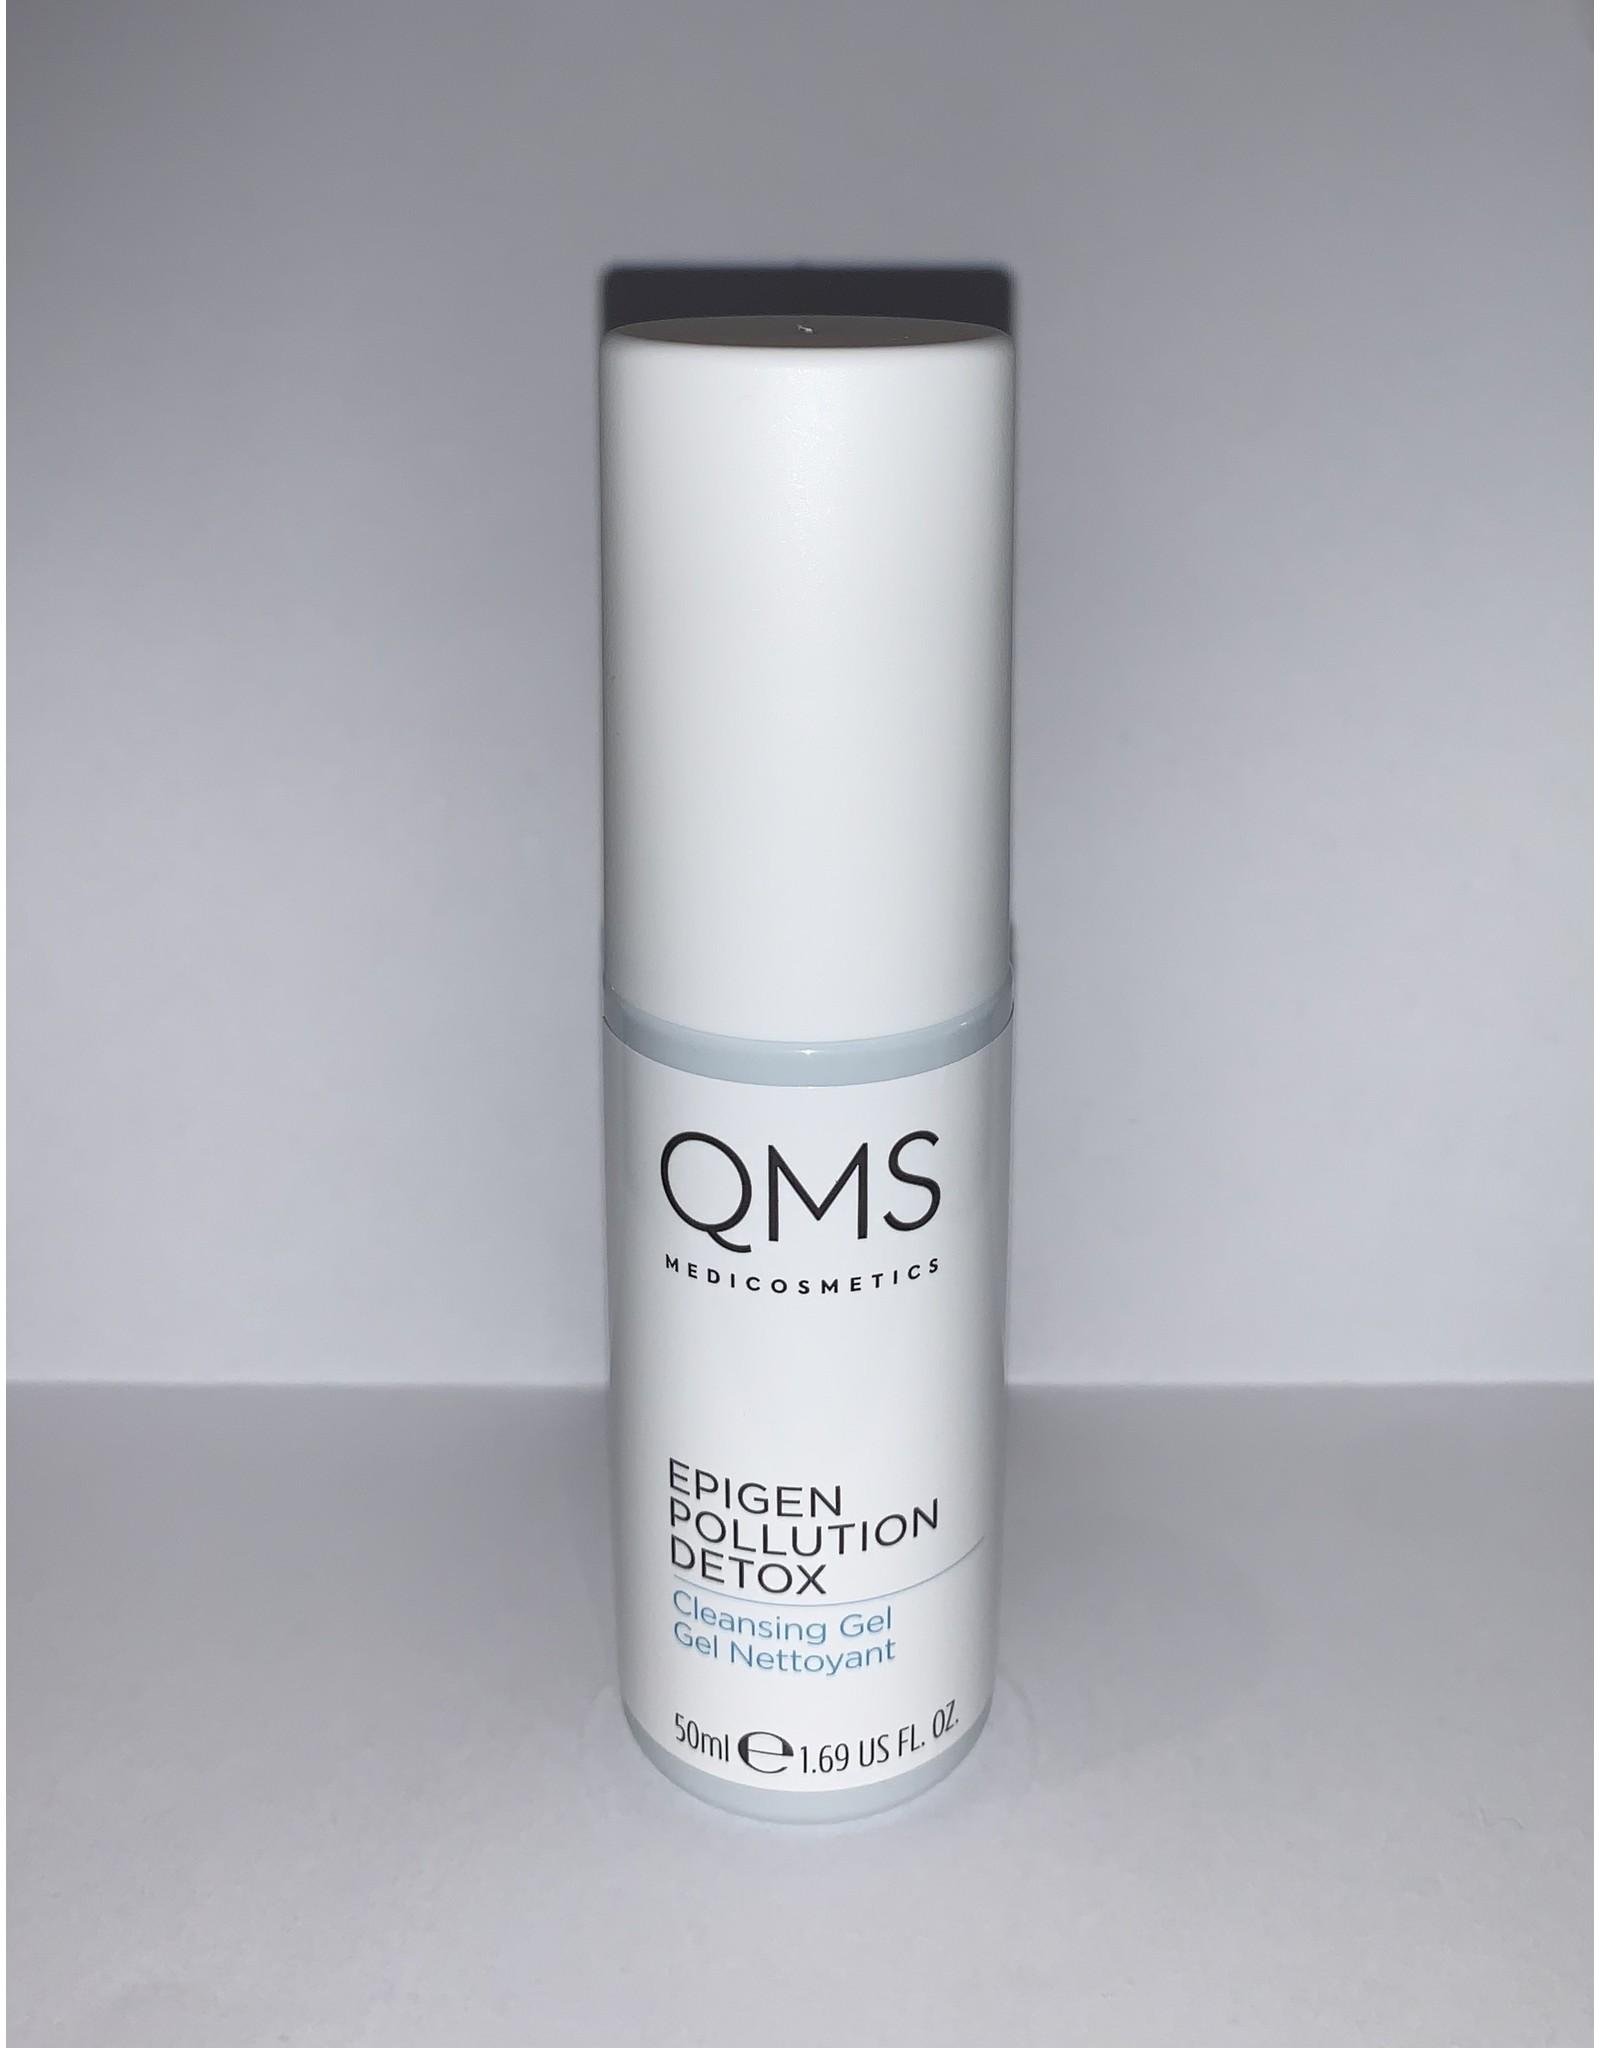 QMS Medicosmetics Travelsize Epigen Pollution Detox, 50ml